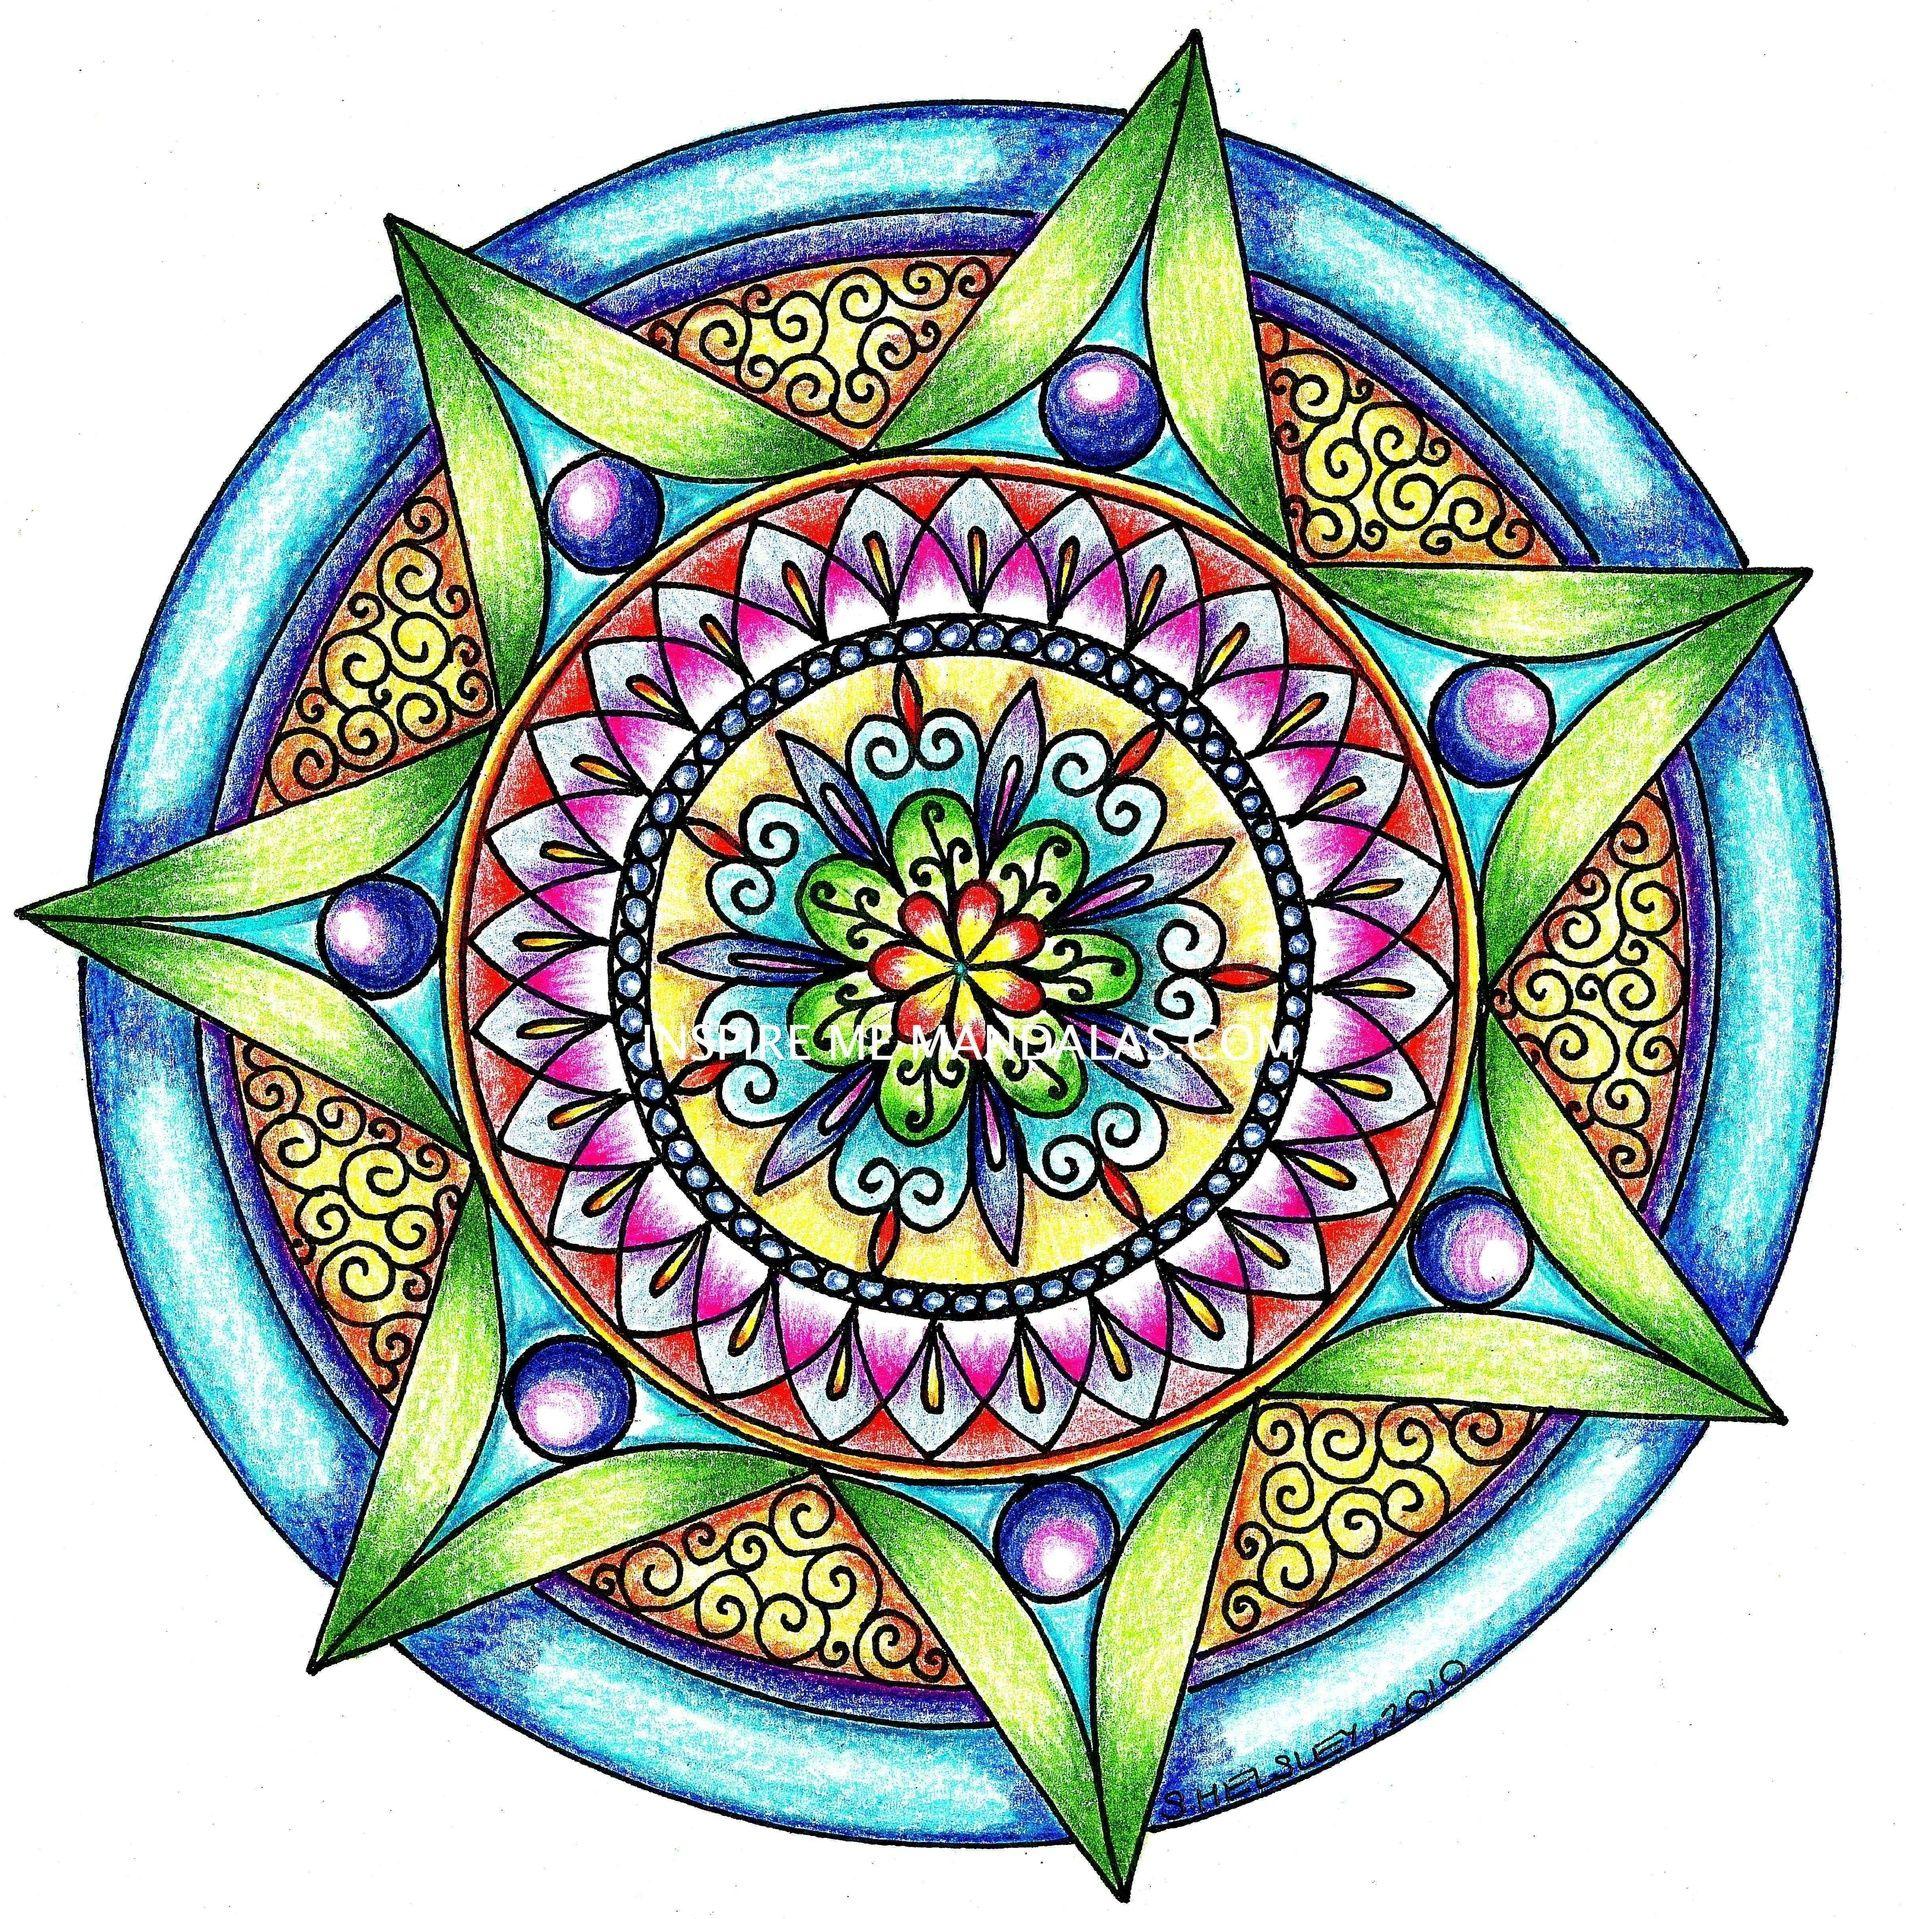 Color art mandala wonders - Color Art